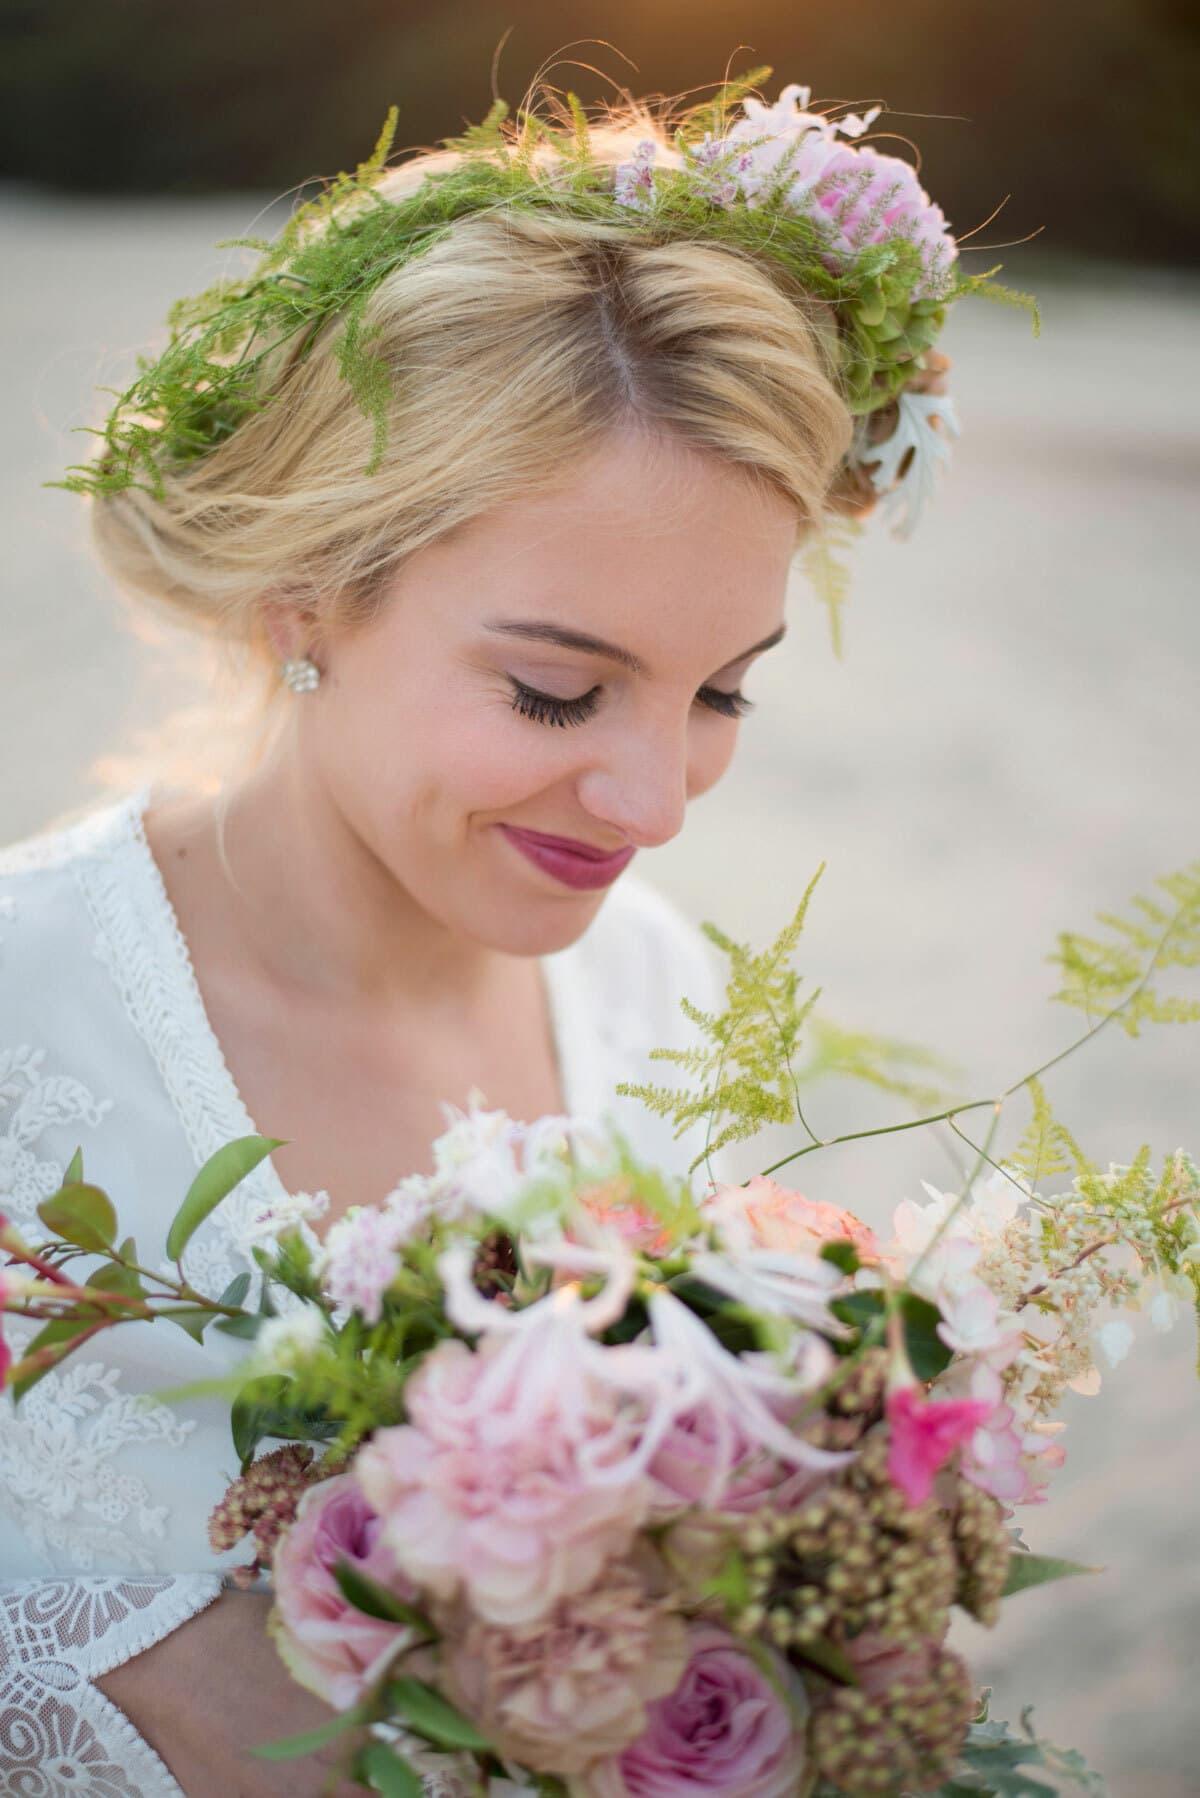 bloemenkrans-bloemen-in-je-haar-kapsel-bruidskapsel